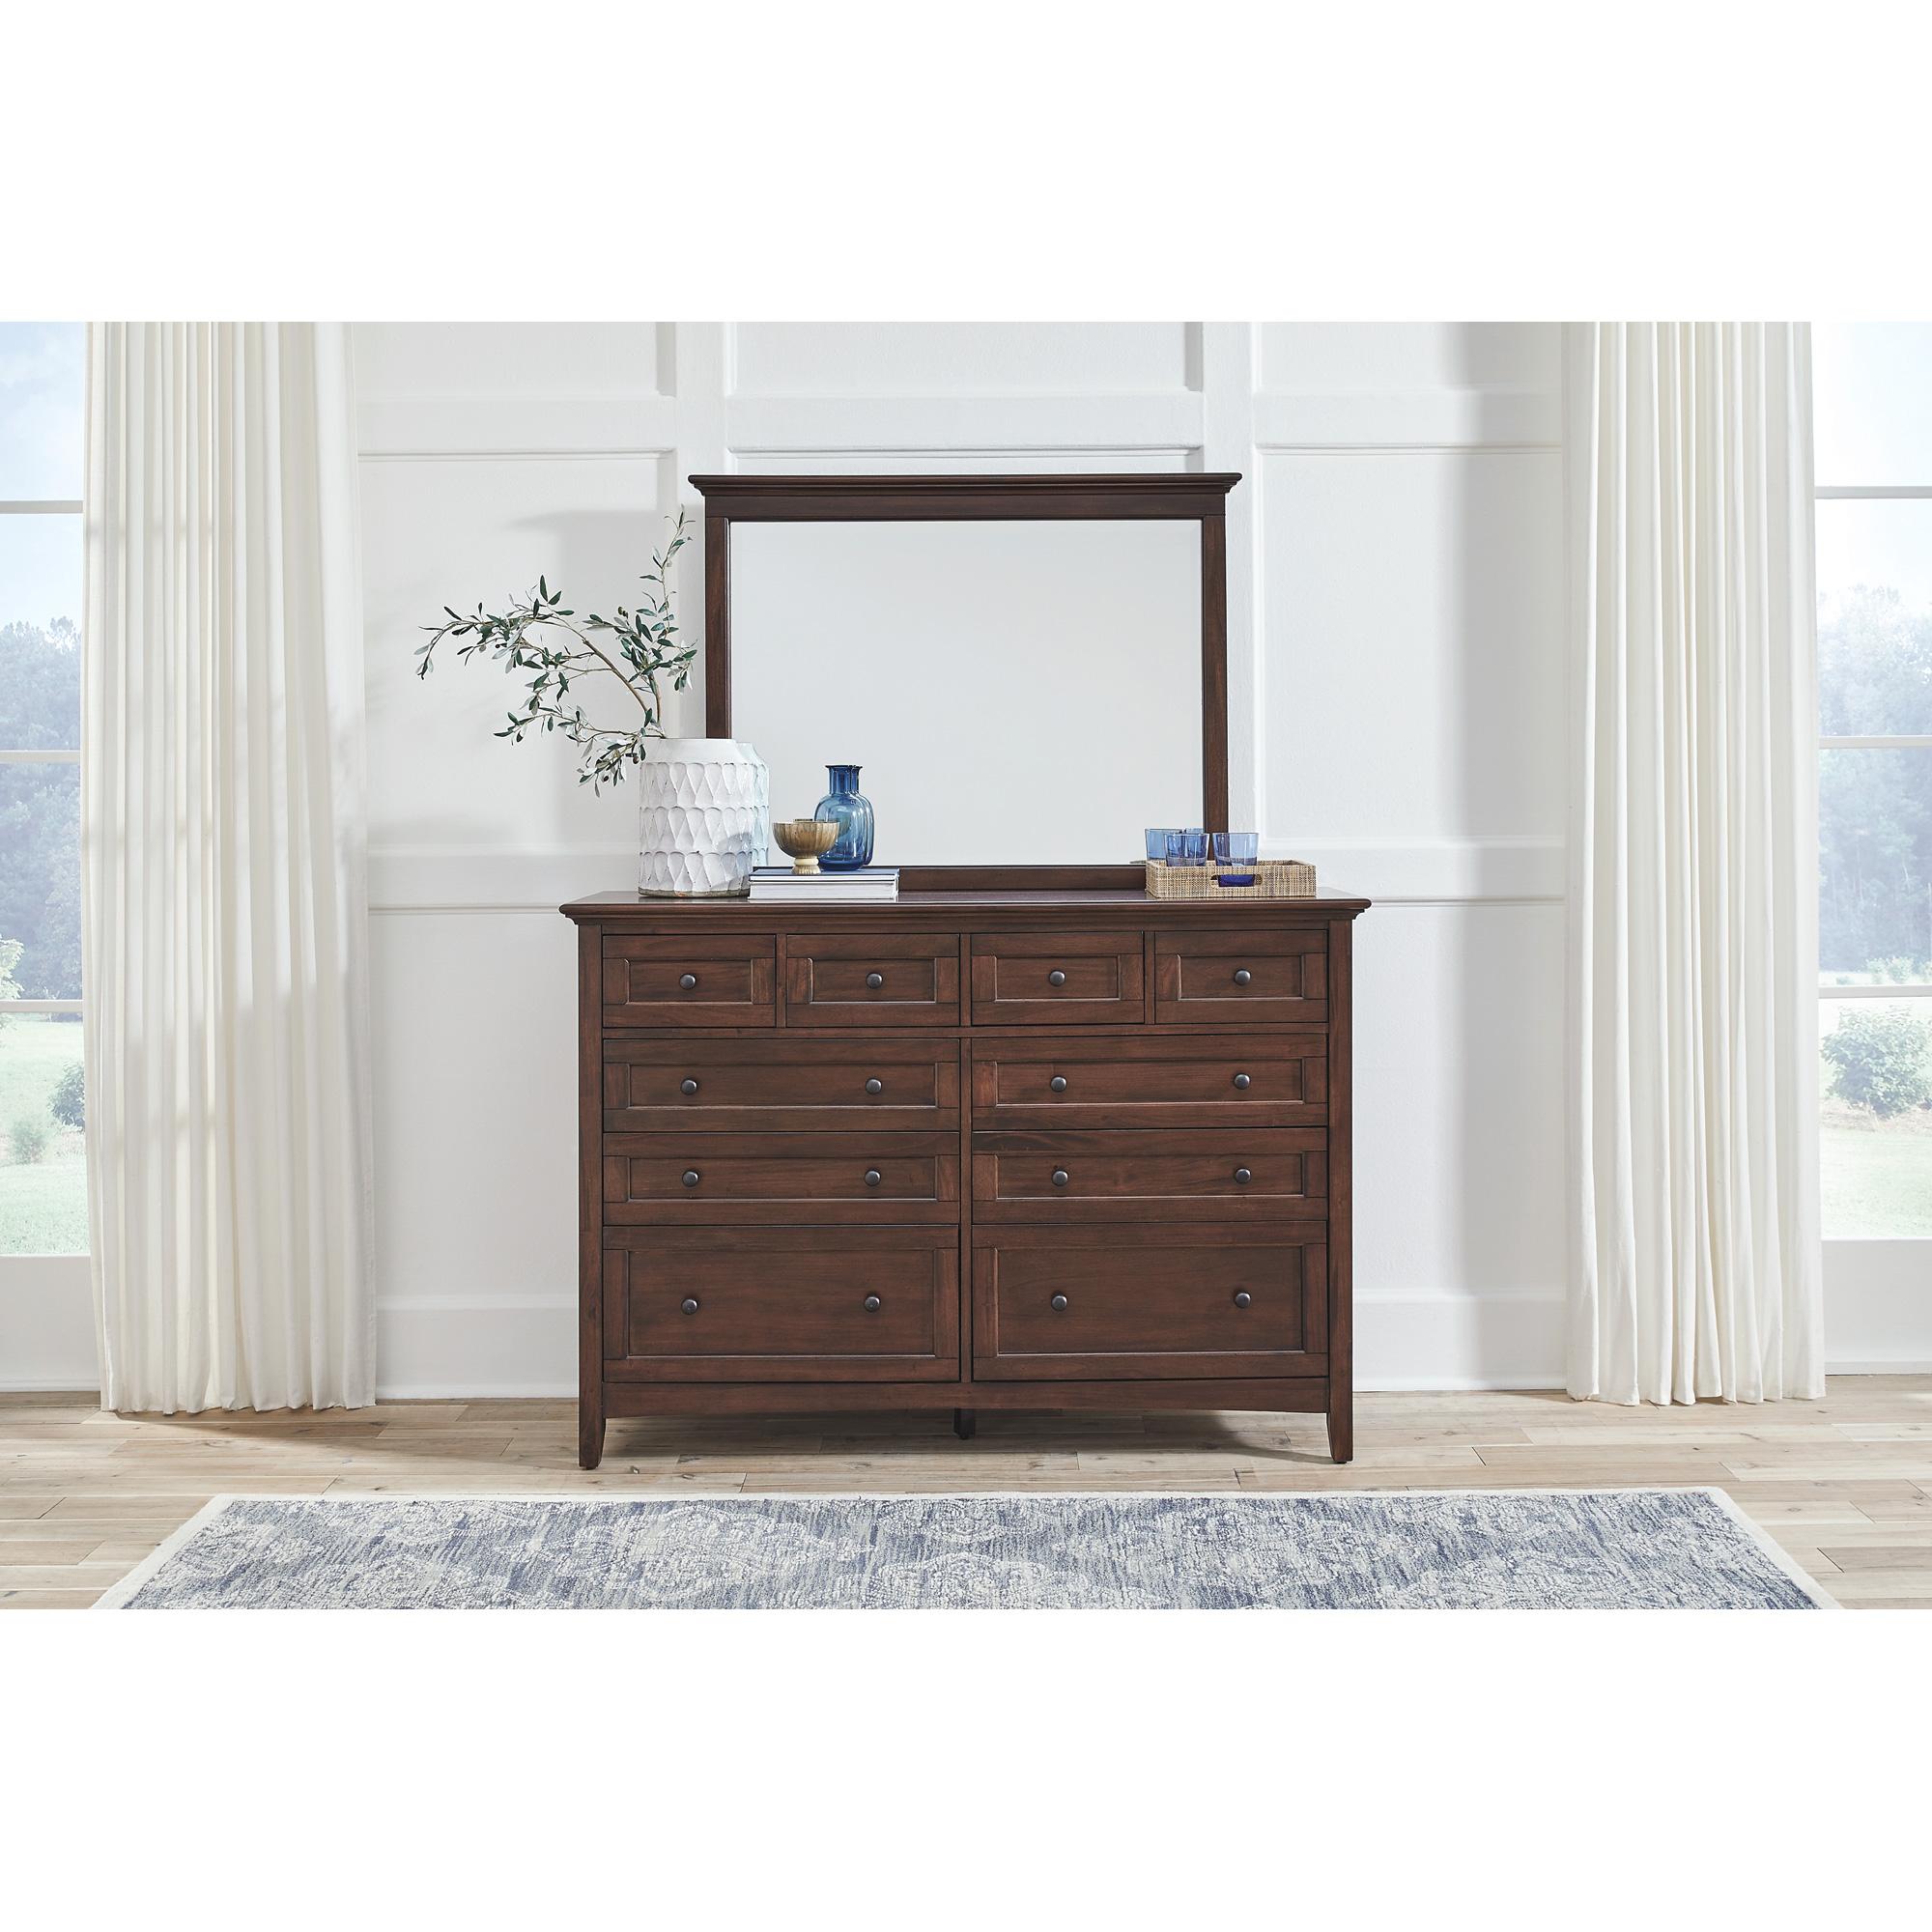 A America | Westlake Cherry Brown Dresser